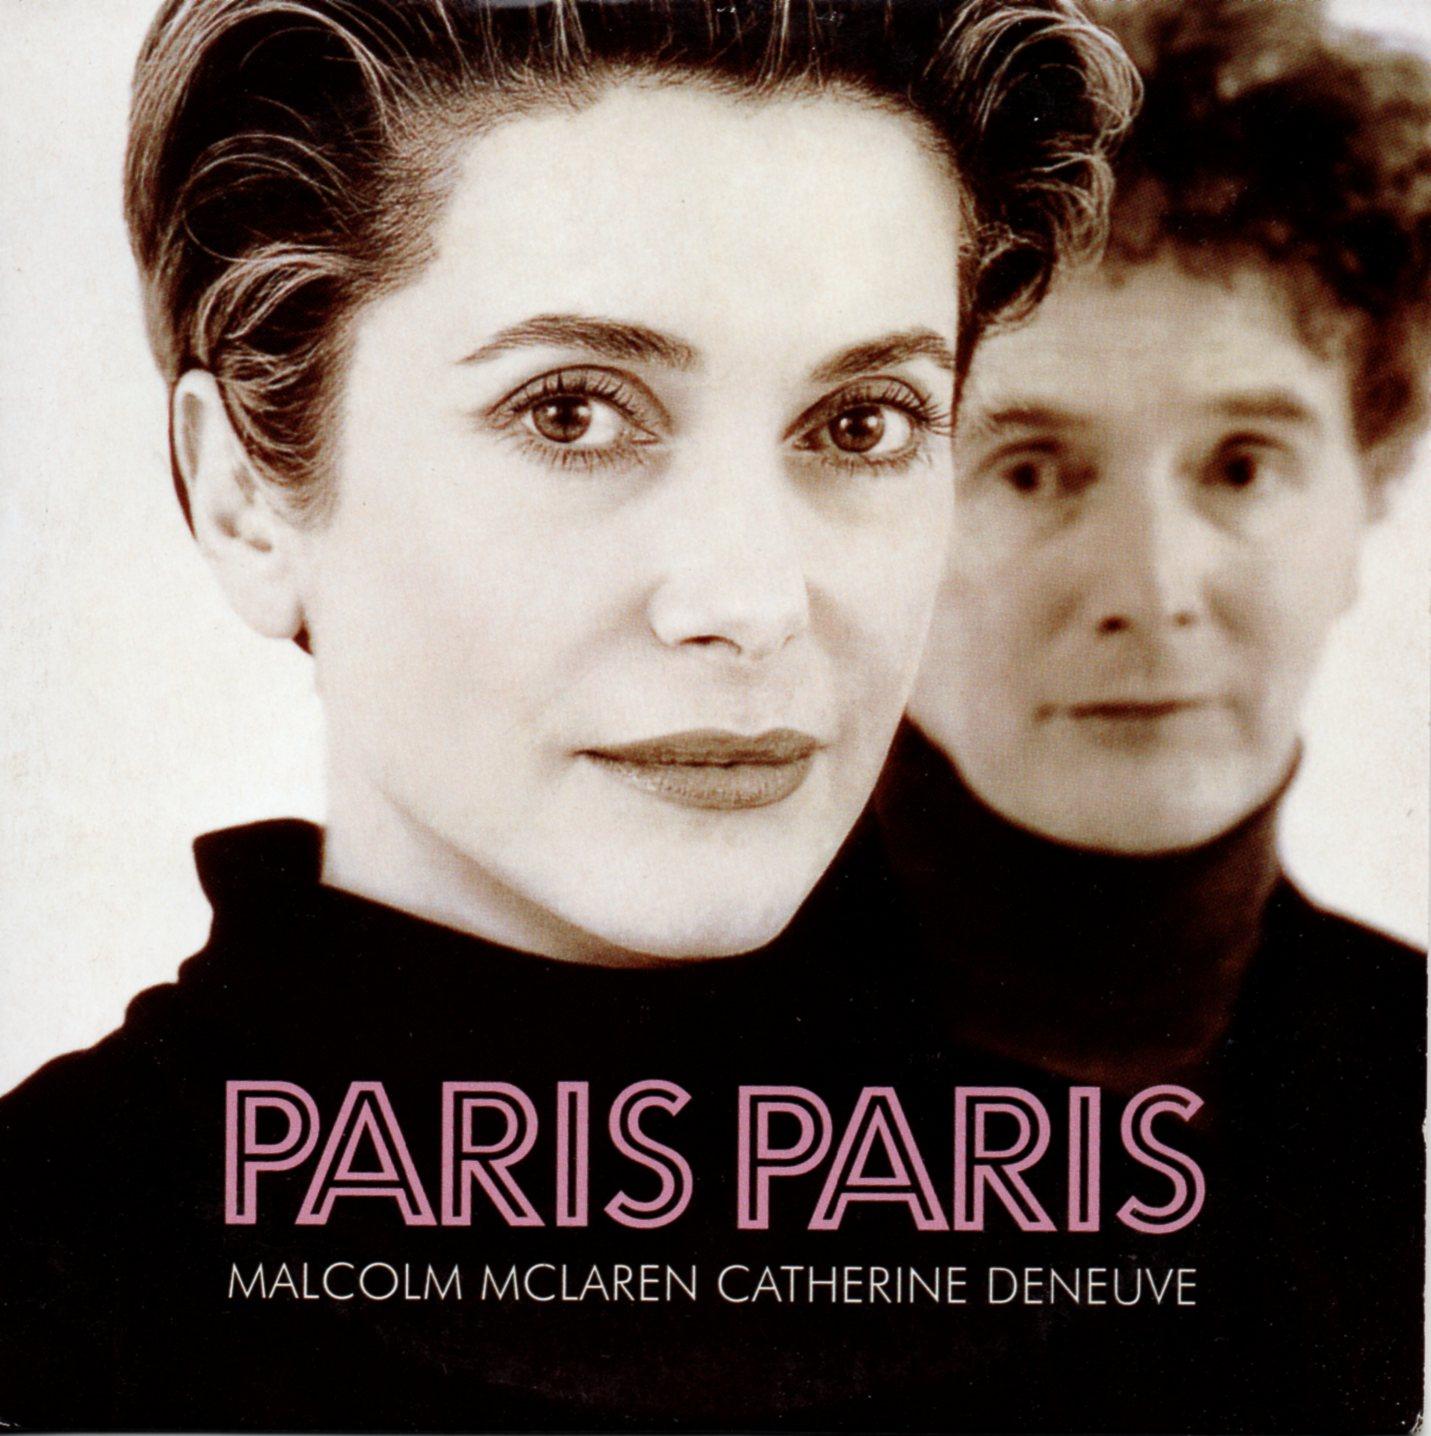 CATHERINE DENEUVE & MALCOLM MCLAREN - Paris Paris 2-Track CARD SLEEVE - CD single